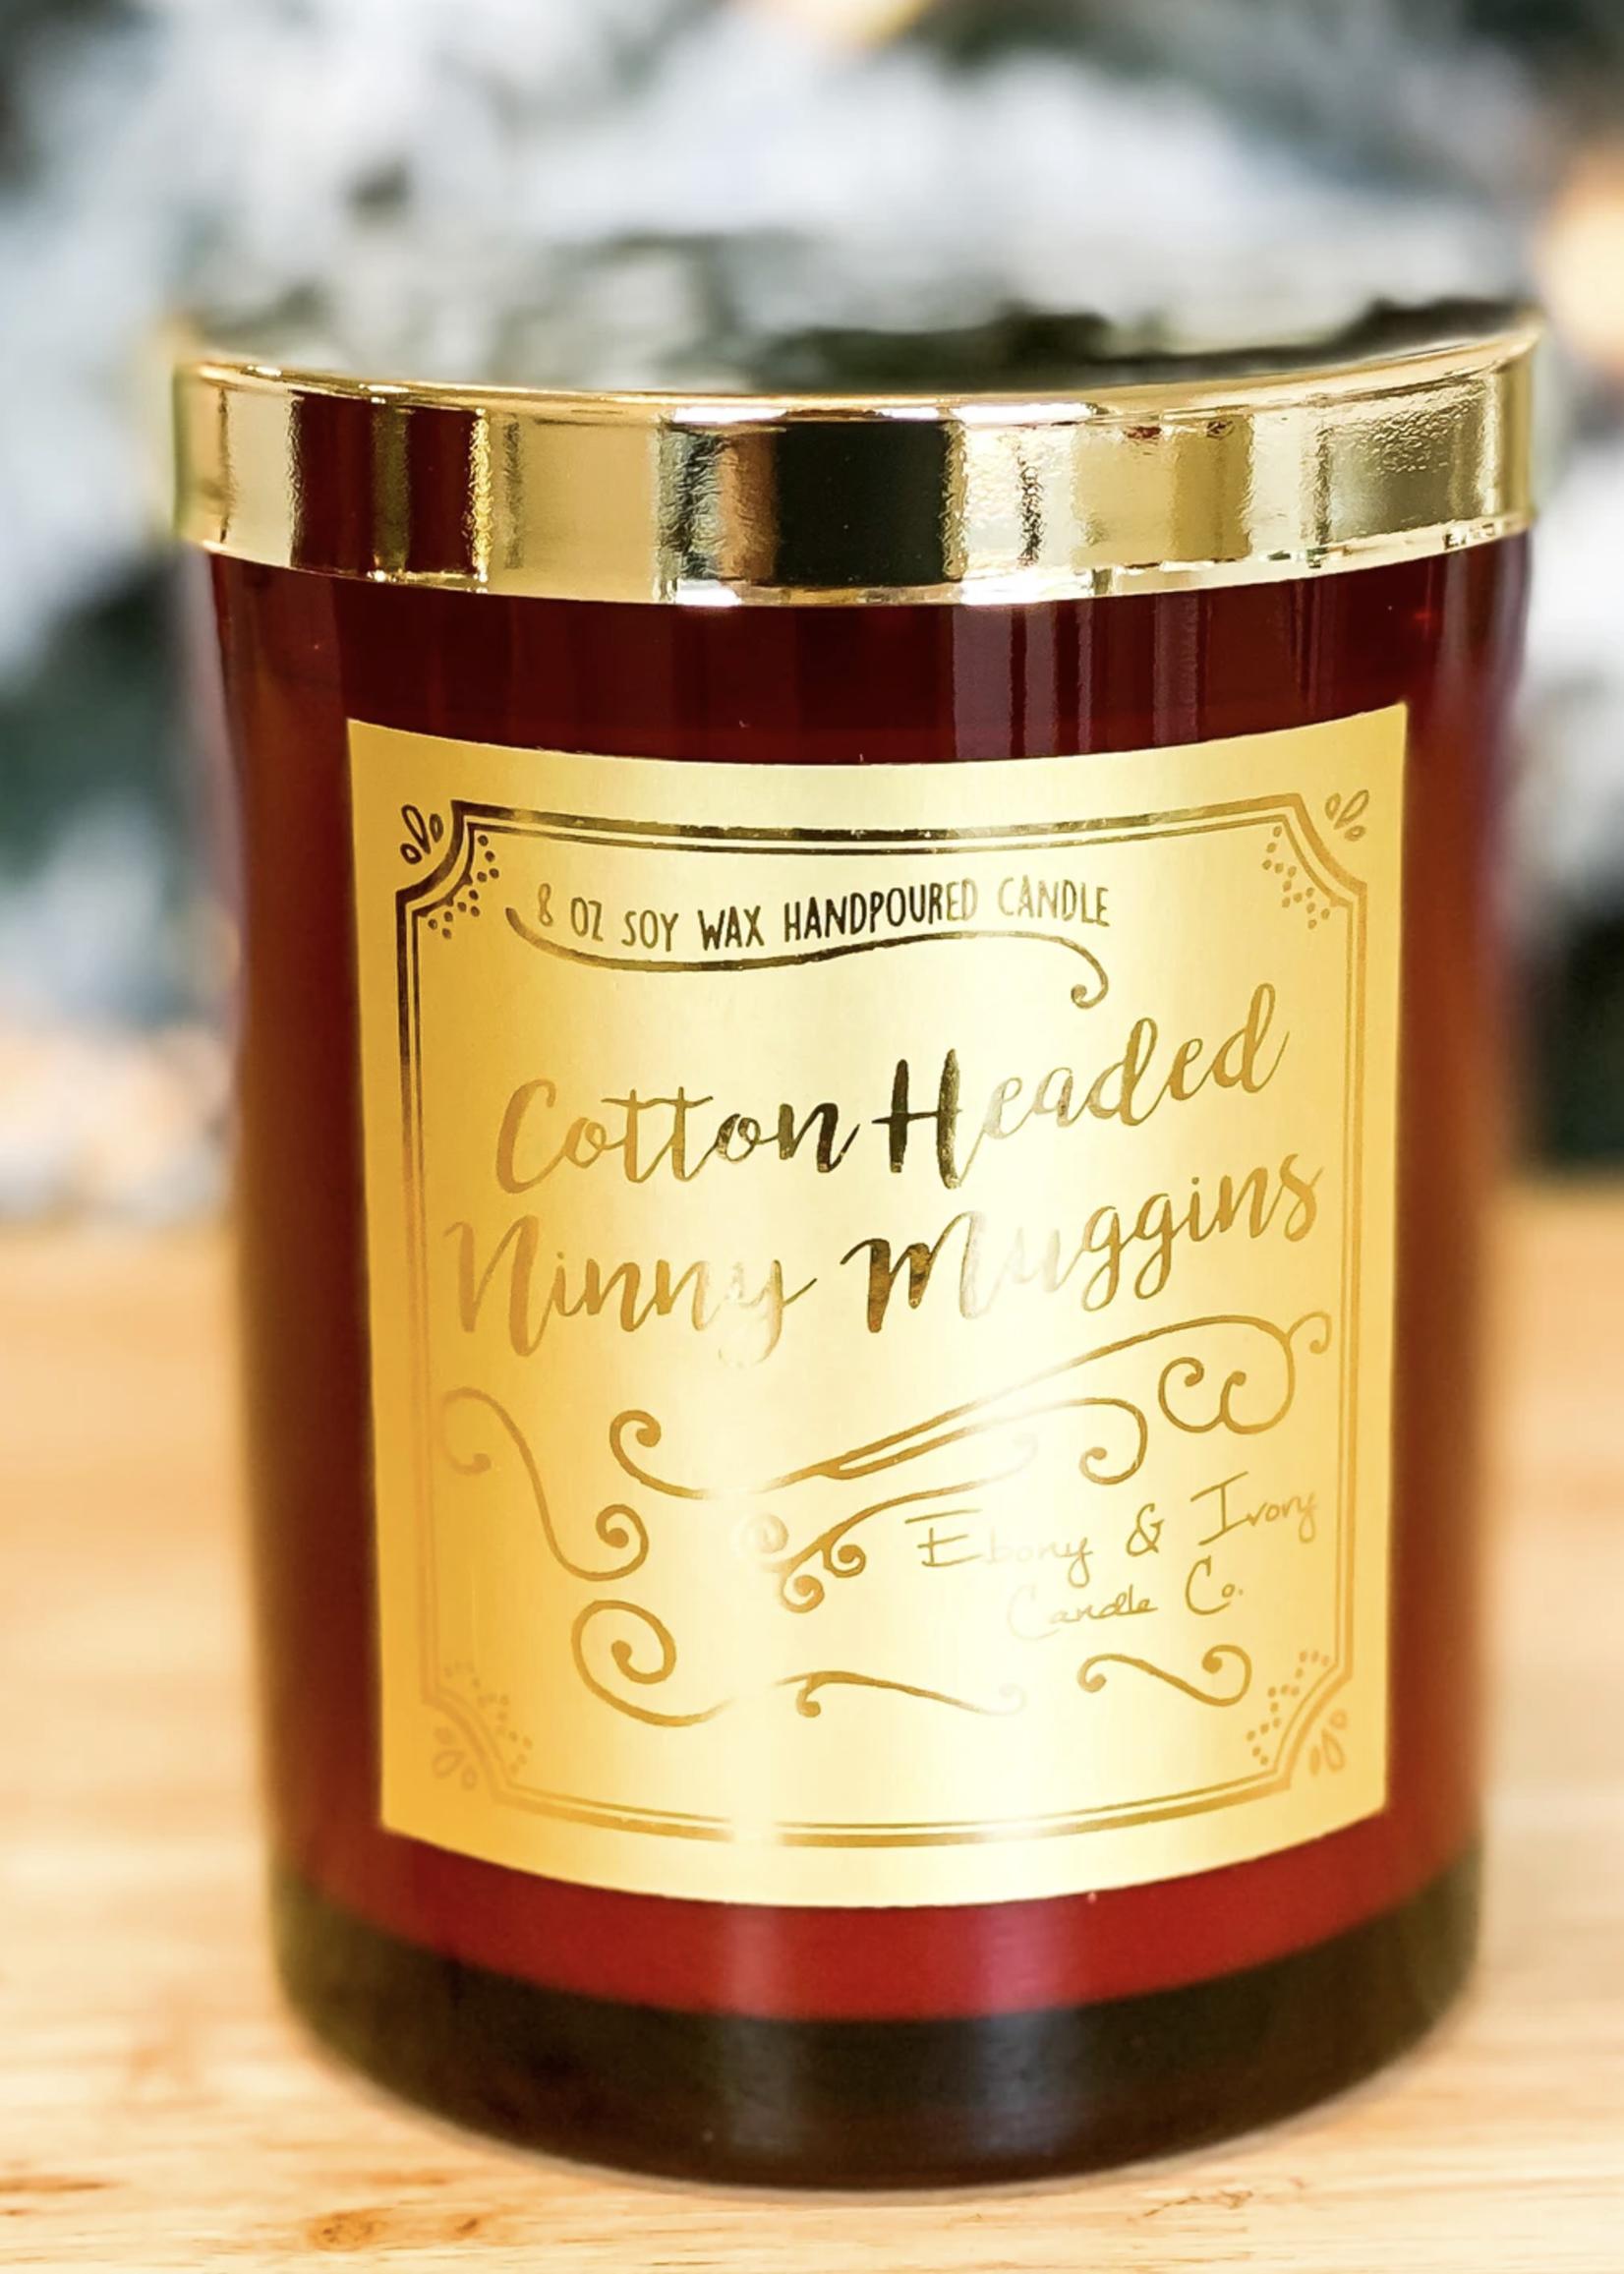 Ebony & Ivory Candle Co. Cotton Headed Ninny Muggins Candle 8oz